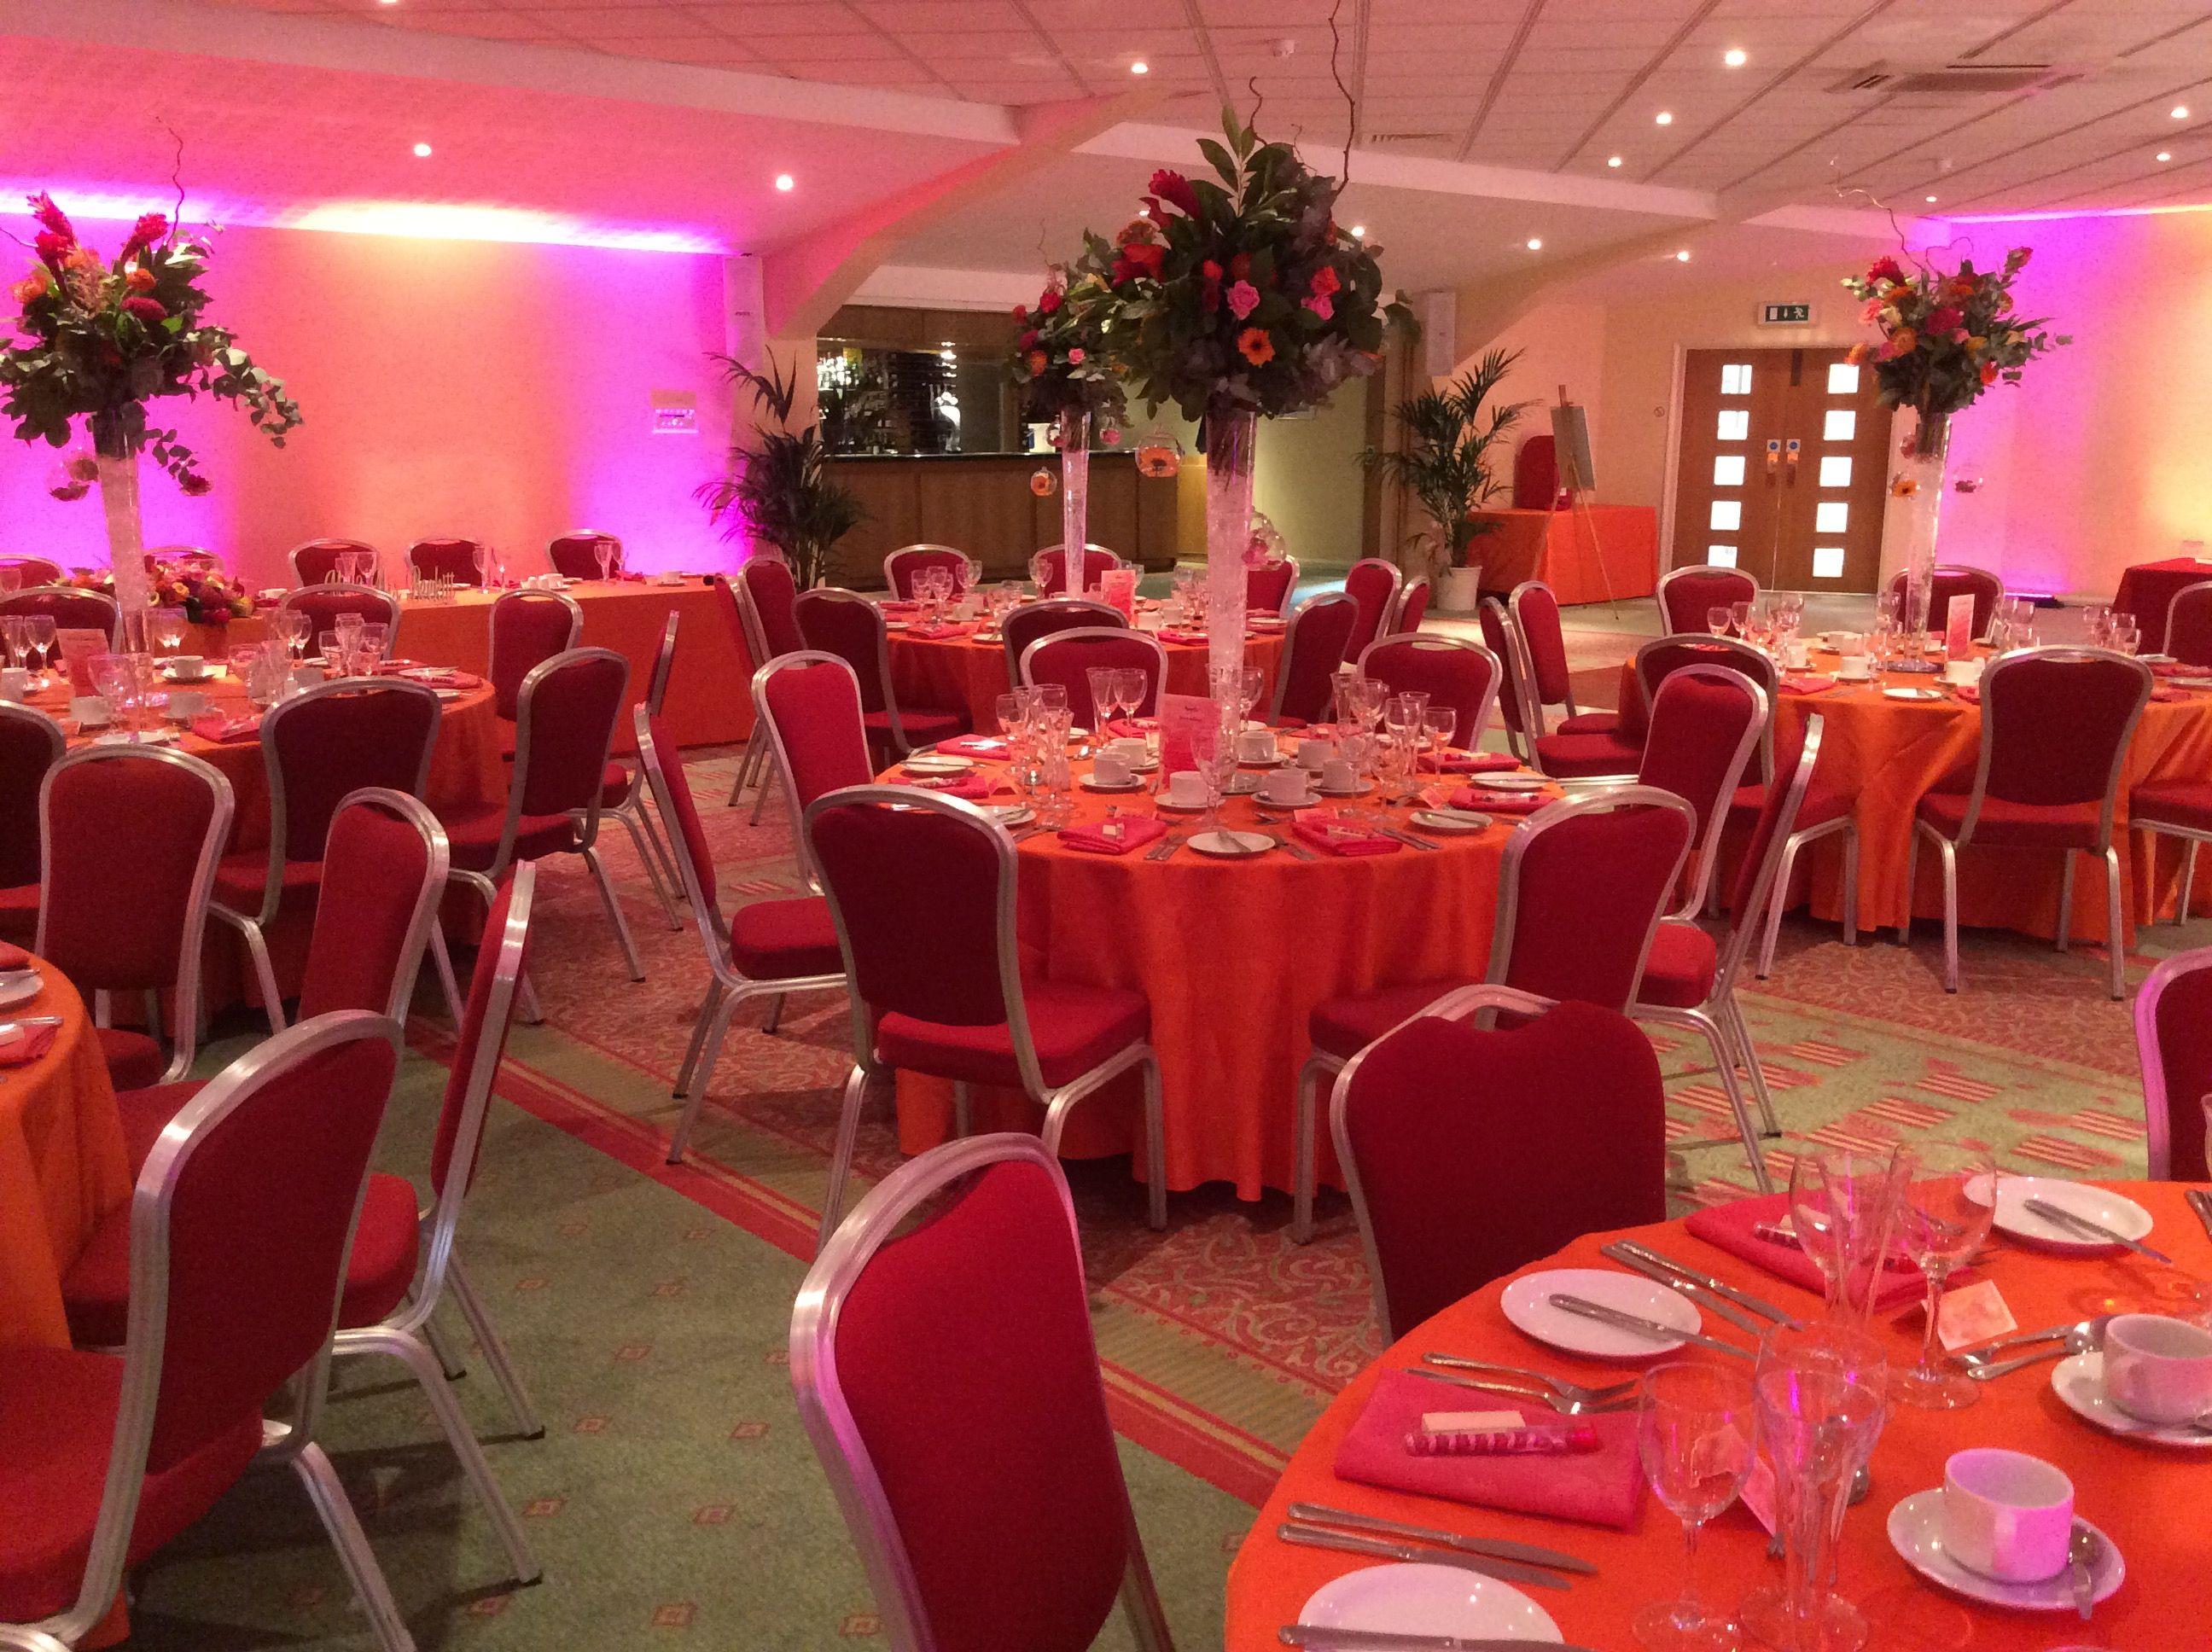 Wedding reception wedding decor ideas  Considered a sunset themed wedding At Greetham Valley we realise